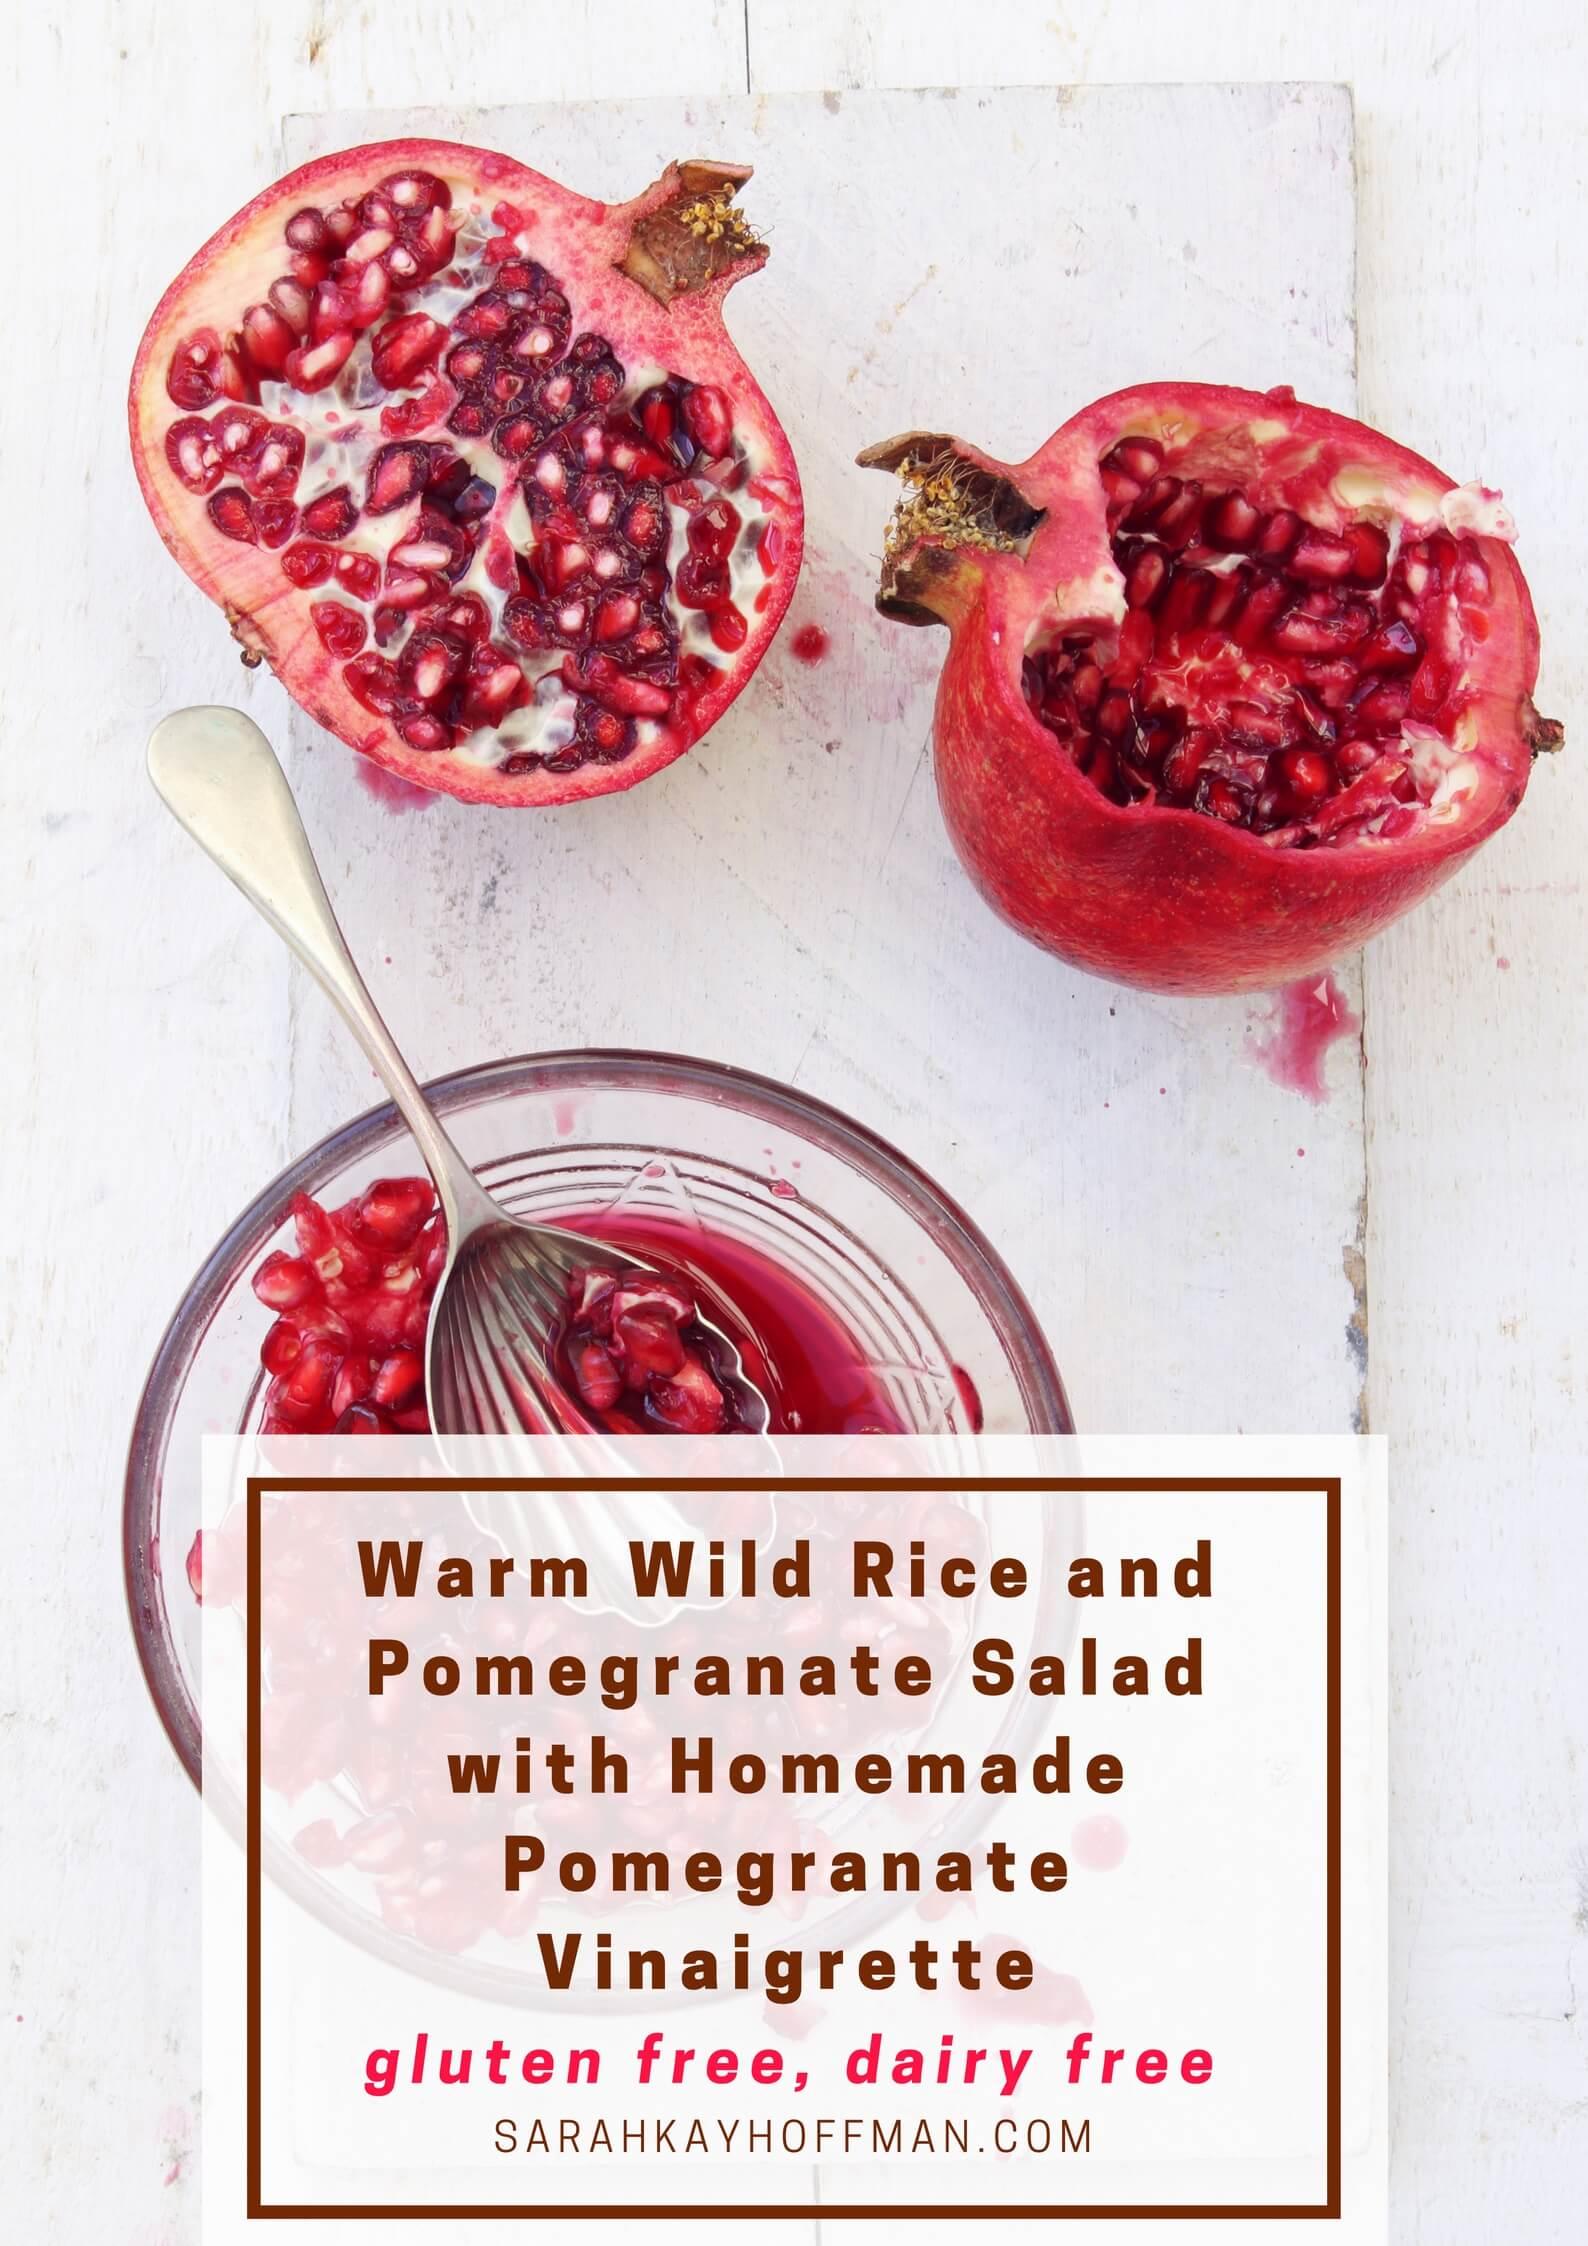 Warm Wild Rice and Pomegranate Salad with Homemade Pomegranate Vinaigrette sarahkayhoffman.com Gluten Free Dairy Free